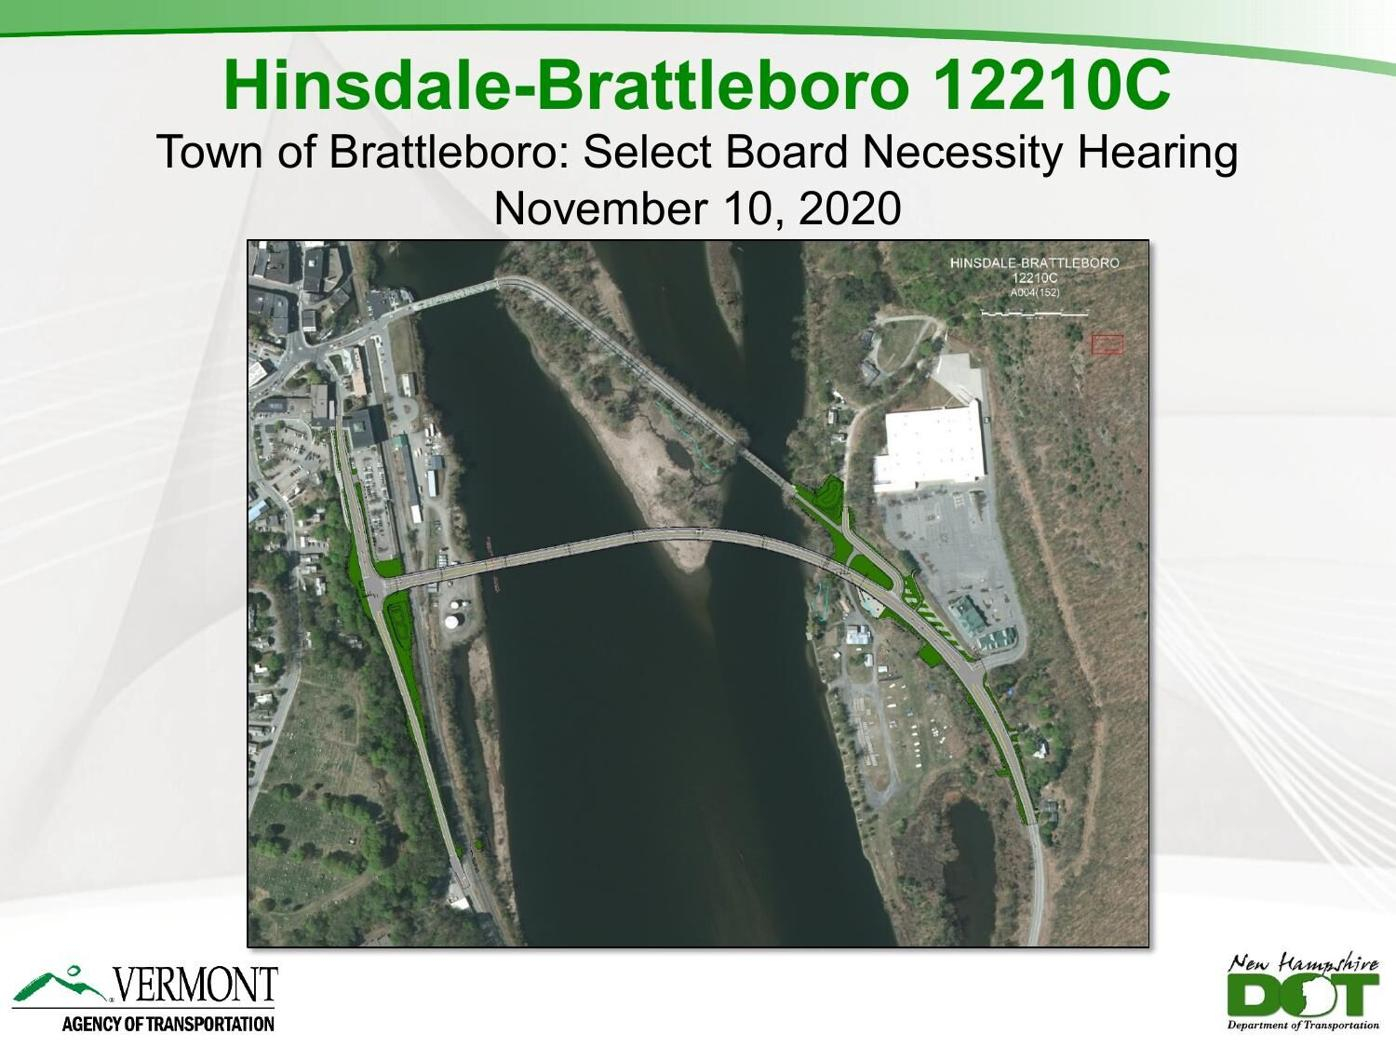 Hinsdale to Brattleboro bridge project